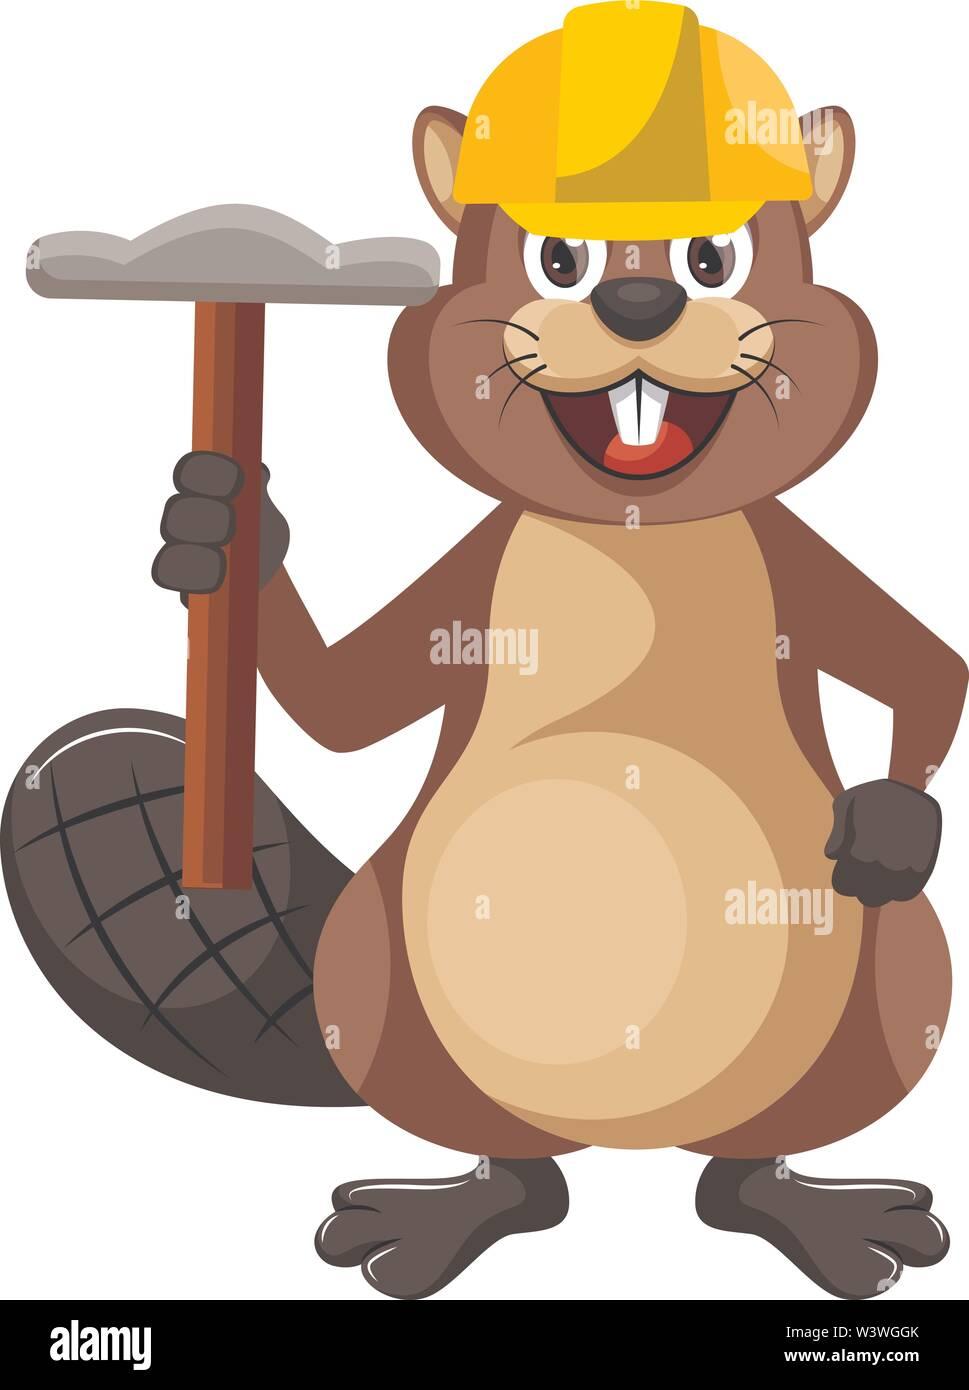 Beaver with hammer, illustration, vector on white background. - Stock Image